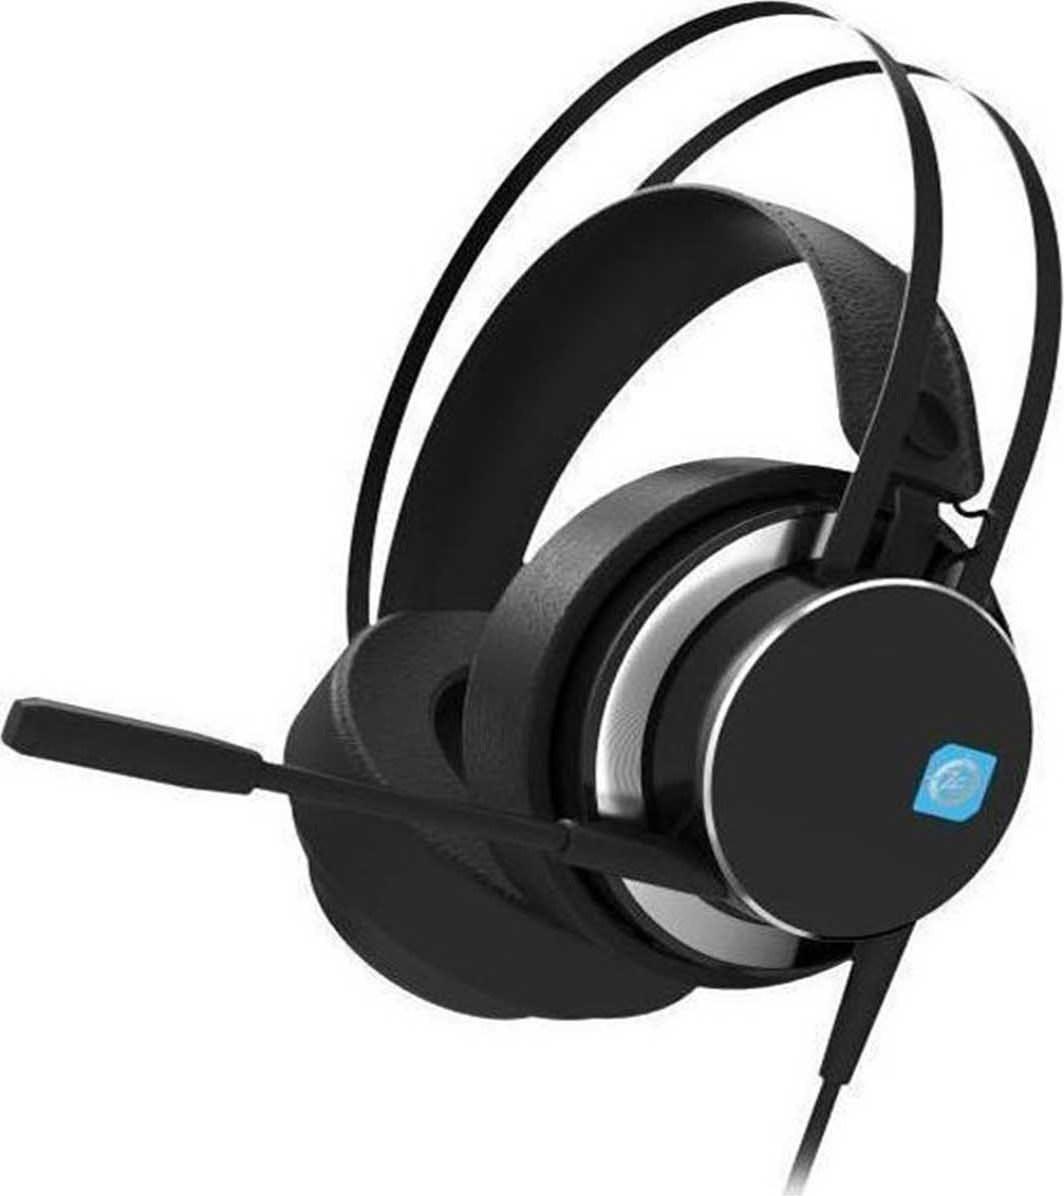 ZeroGround HD-2400G Keiji Usb Gaming Headset